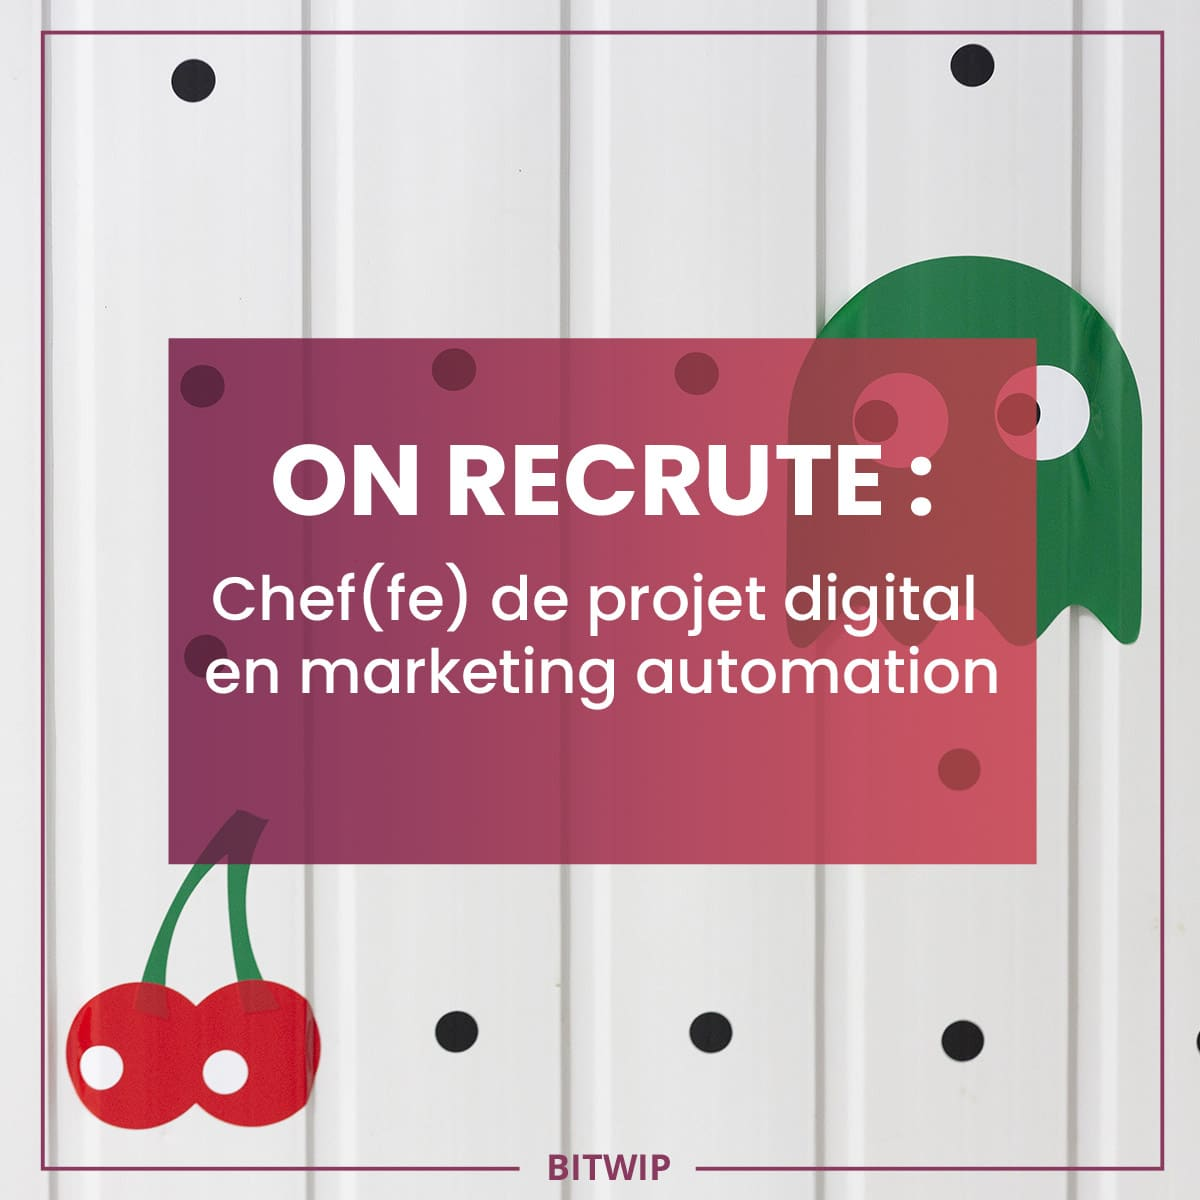 BITWIP - Chef(fe) de projet digital automation marketing - 2020-01